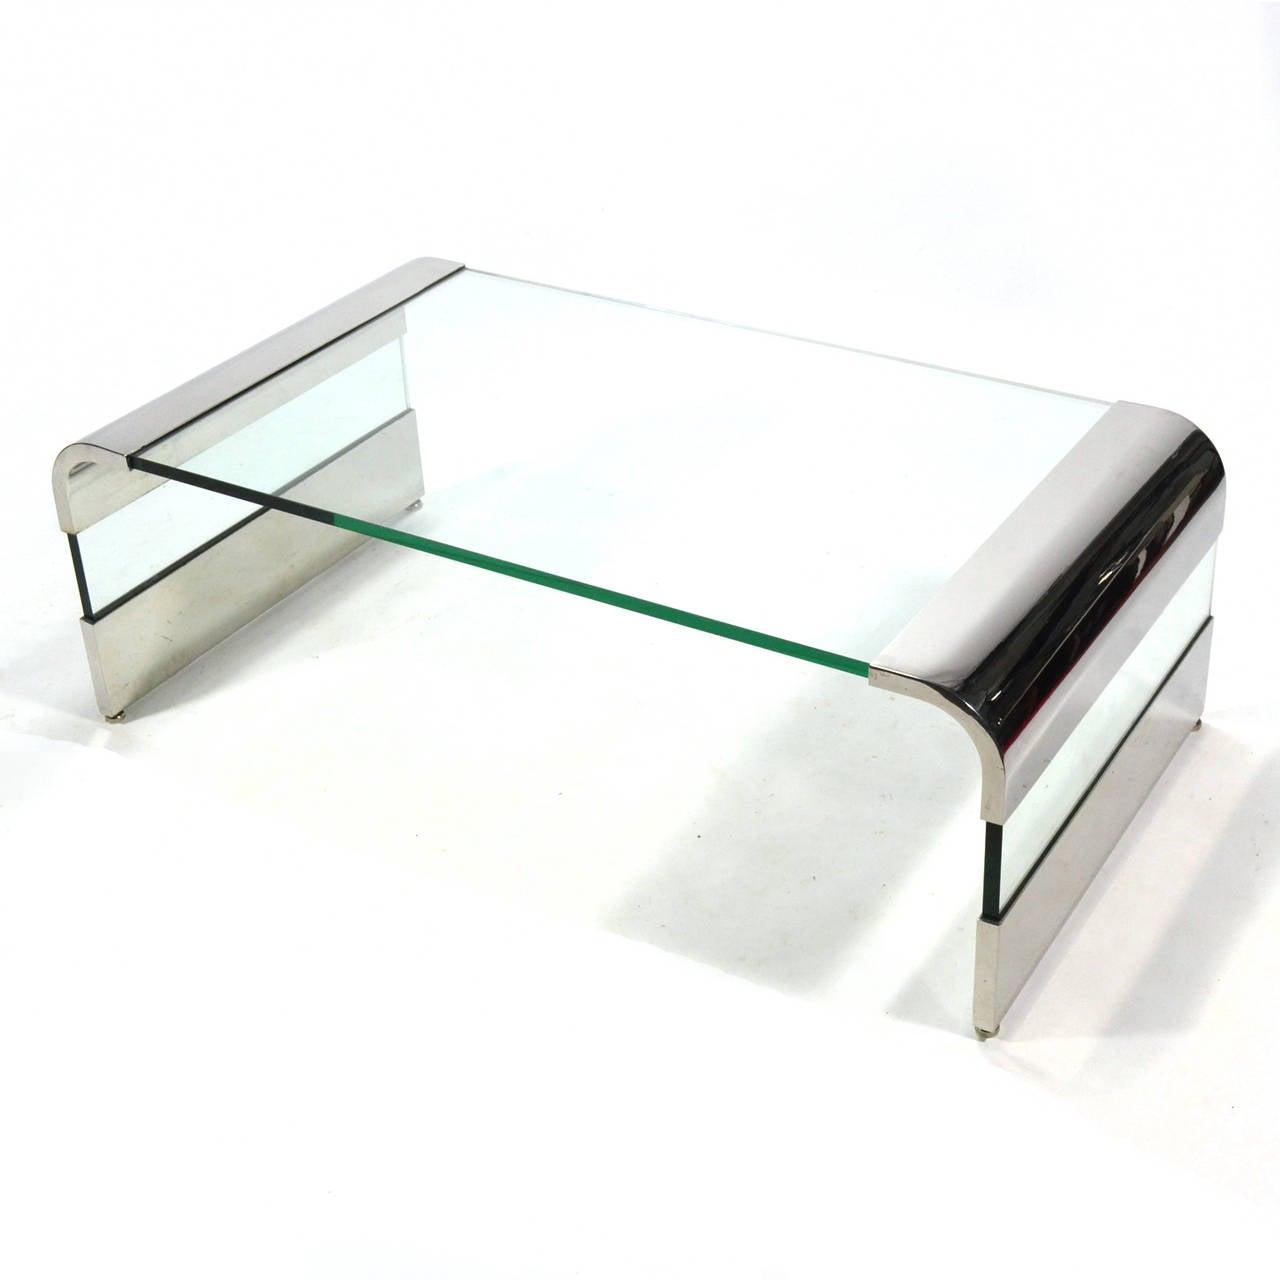 leon rosen chrome and glass waterfall coffee table by pace for  - leon rosen chrome and glass waterfall coffee table by pace